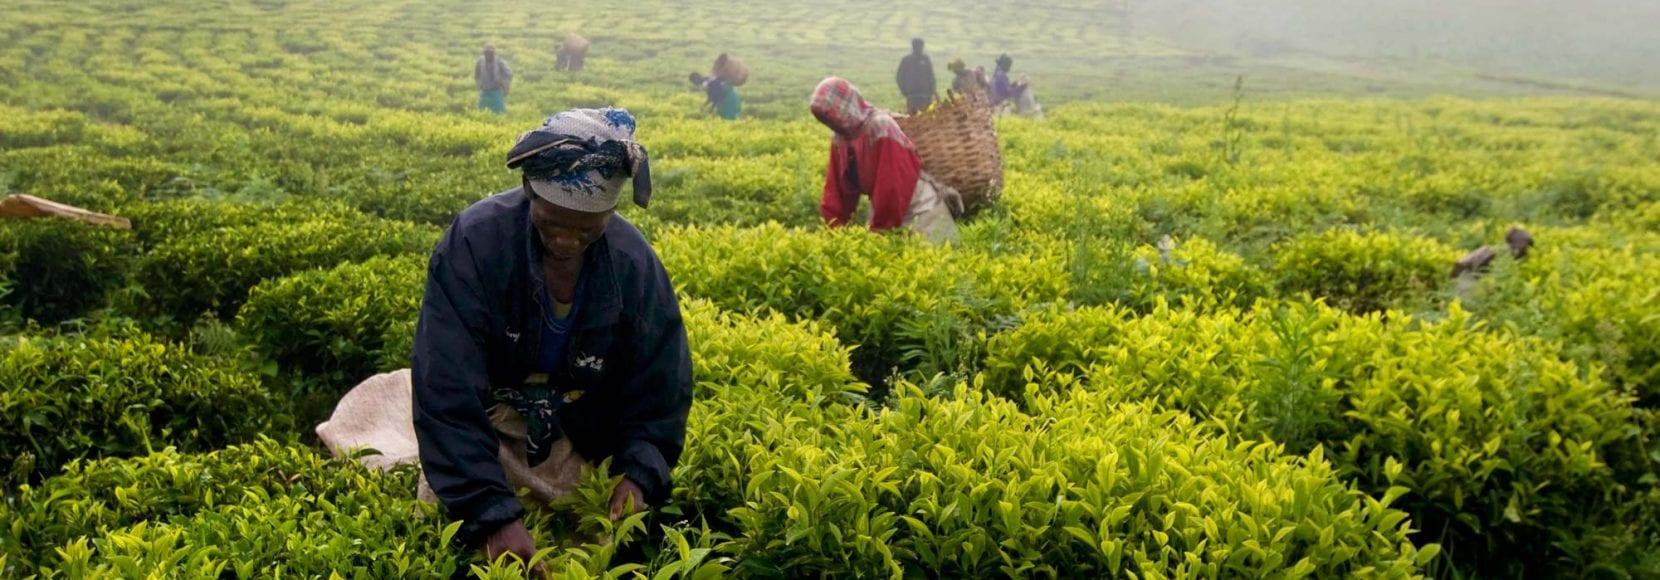 Vast farmland in Tanzania